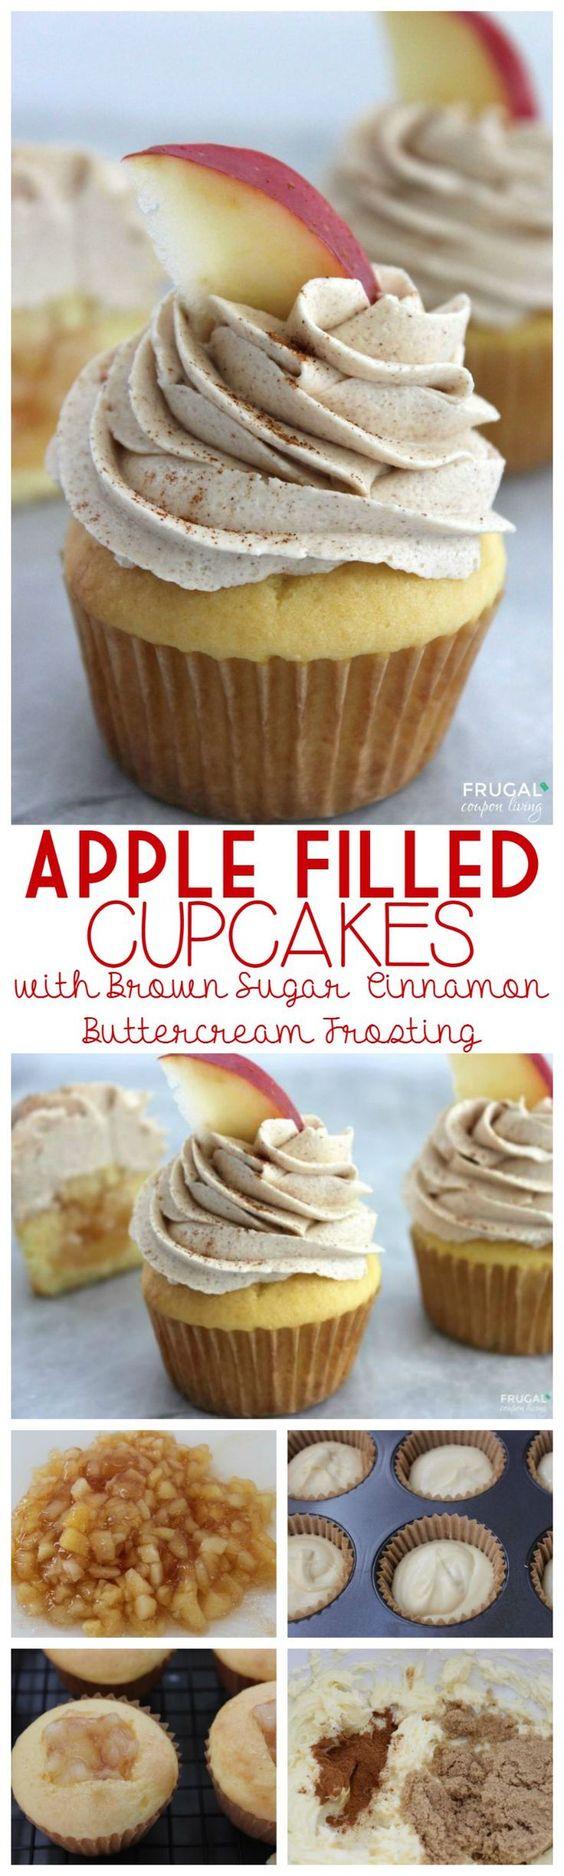 diy cupcakes recipes homemade cupcakes frugal cake mix recipes cupcake ...